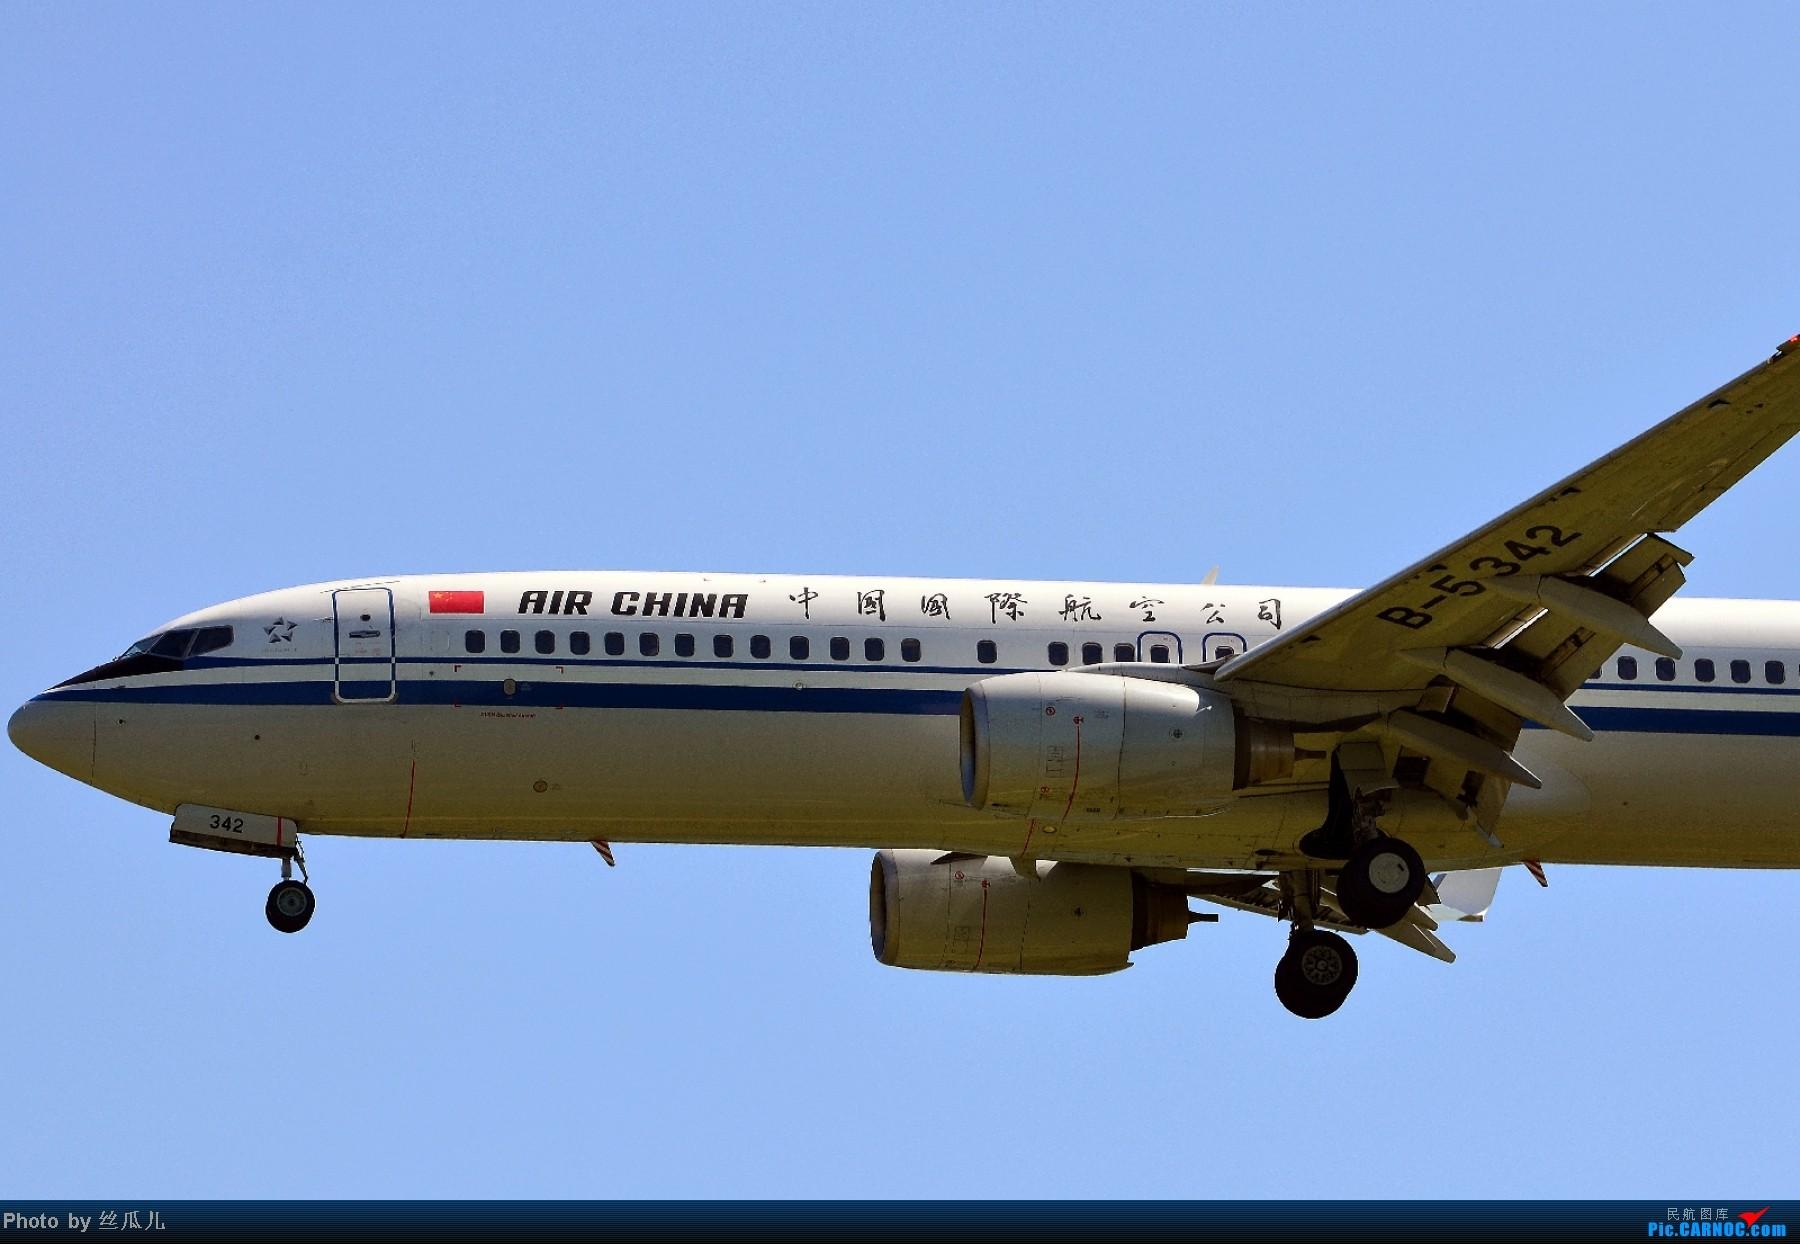 Re:[原创]长途奔袭鸟窝所得,HGH-PEK-HGH,鸟窝上空在我登基前的最后时刻云开雾散,感谢国家!感谢首都人民!感谢飞友网!感谢新华网!感谢CCTV!! BOEING 737-800 B-5342 中国北京首都机场